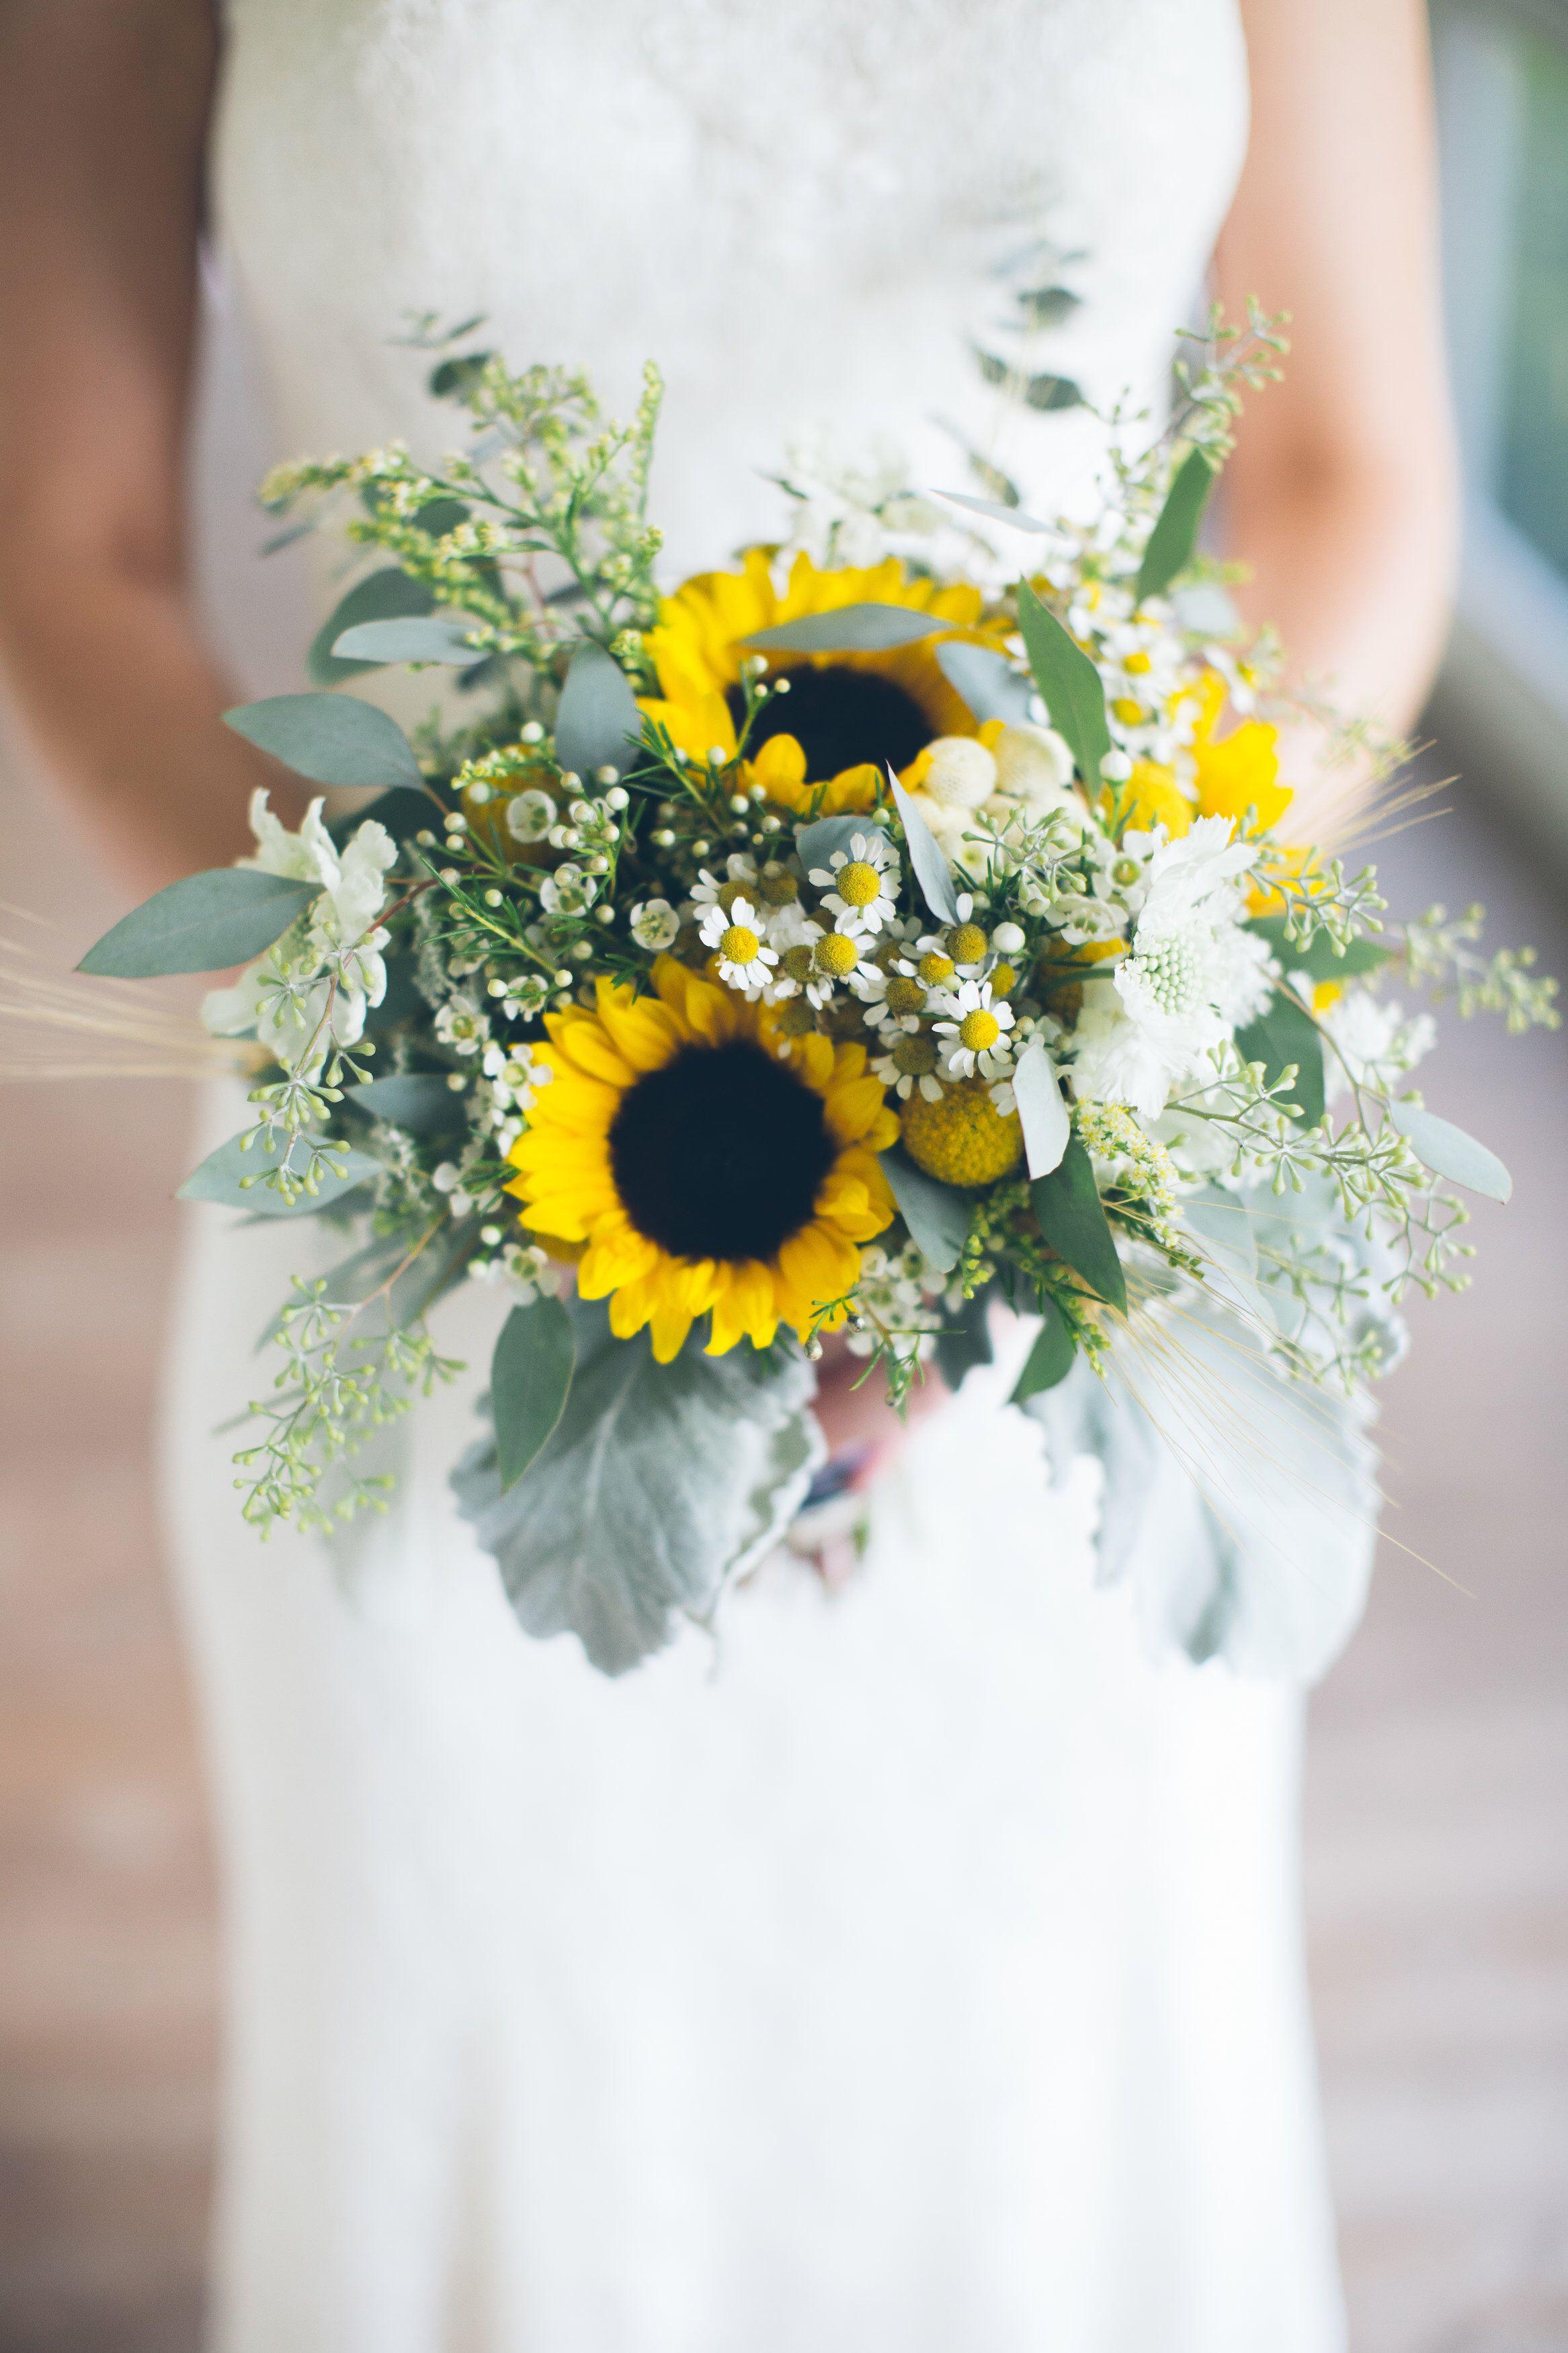 Bridal bouquets Sunflower wedding Sunflower and wheat Dusty miller fever few wax